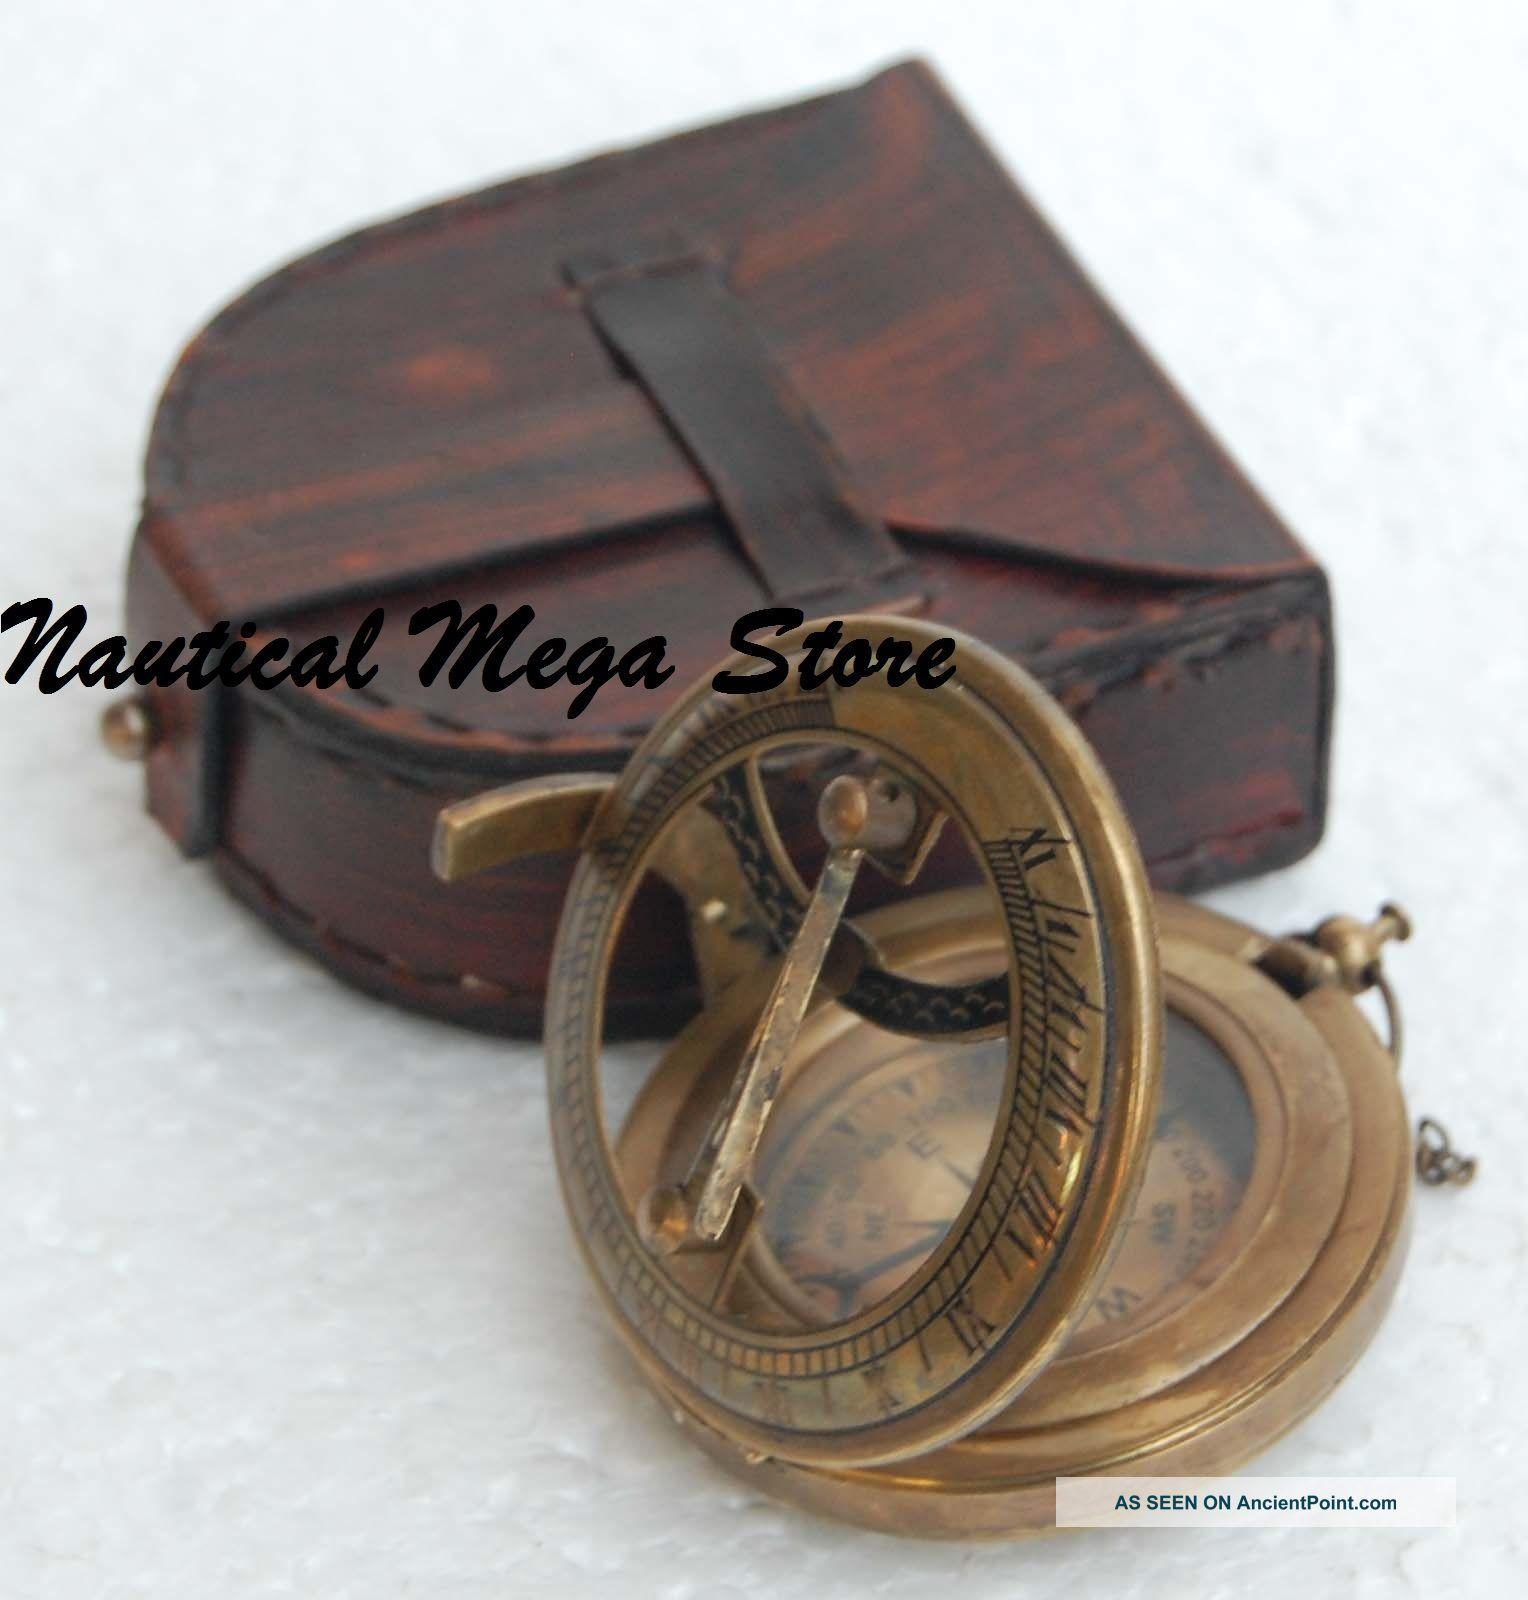 Antique Steampunk Nautical Brass Compass & Sundial Push Button Type Sundial Compasses photo